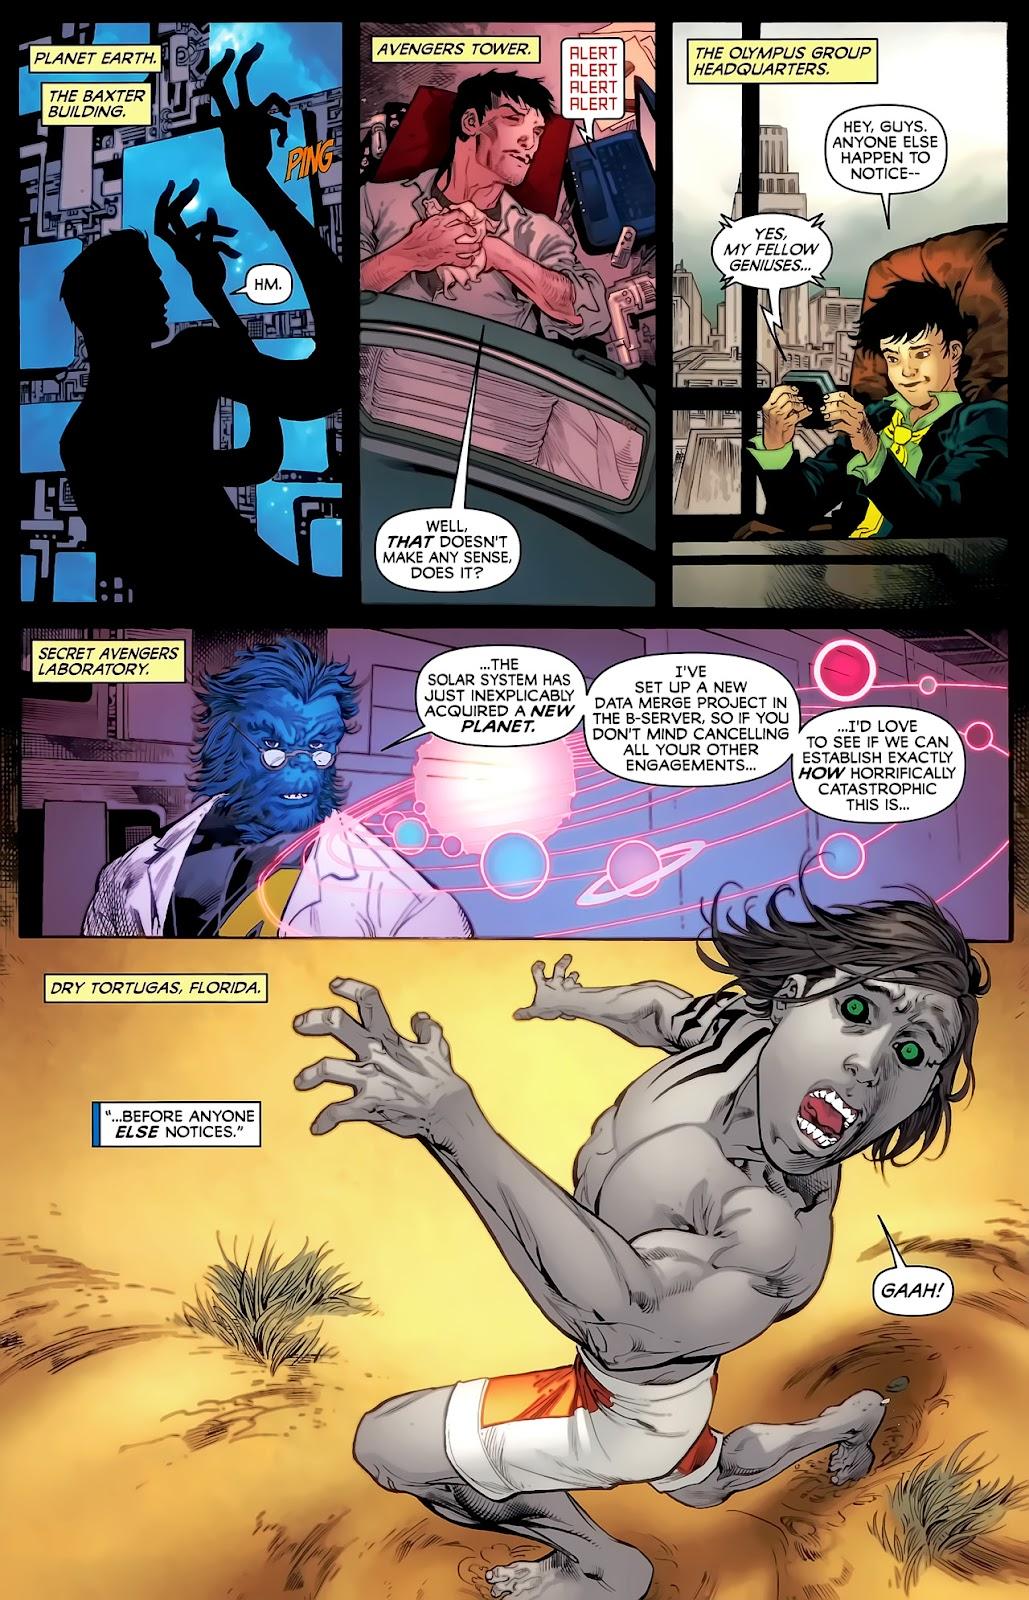 Incredible Hulks (2010) Issue #613 #3 - English 19